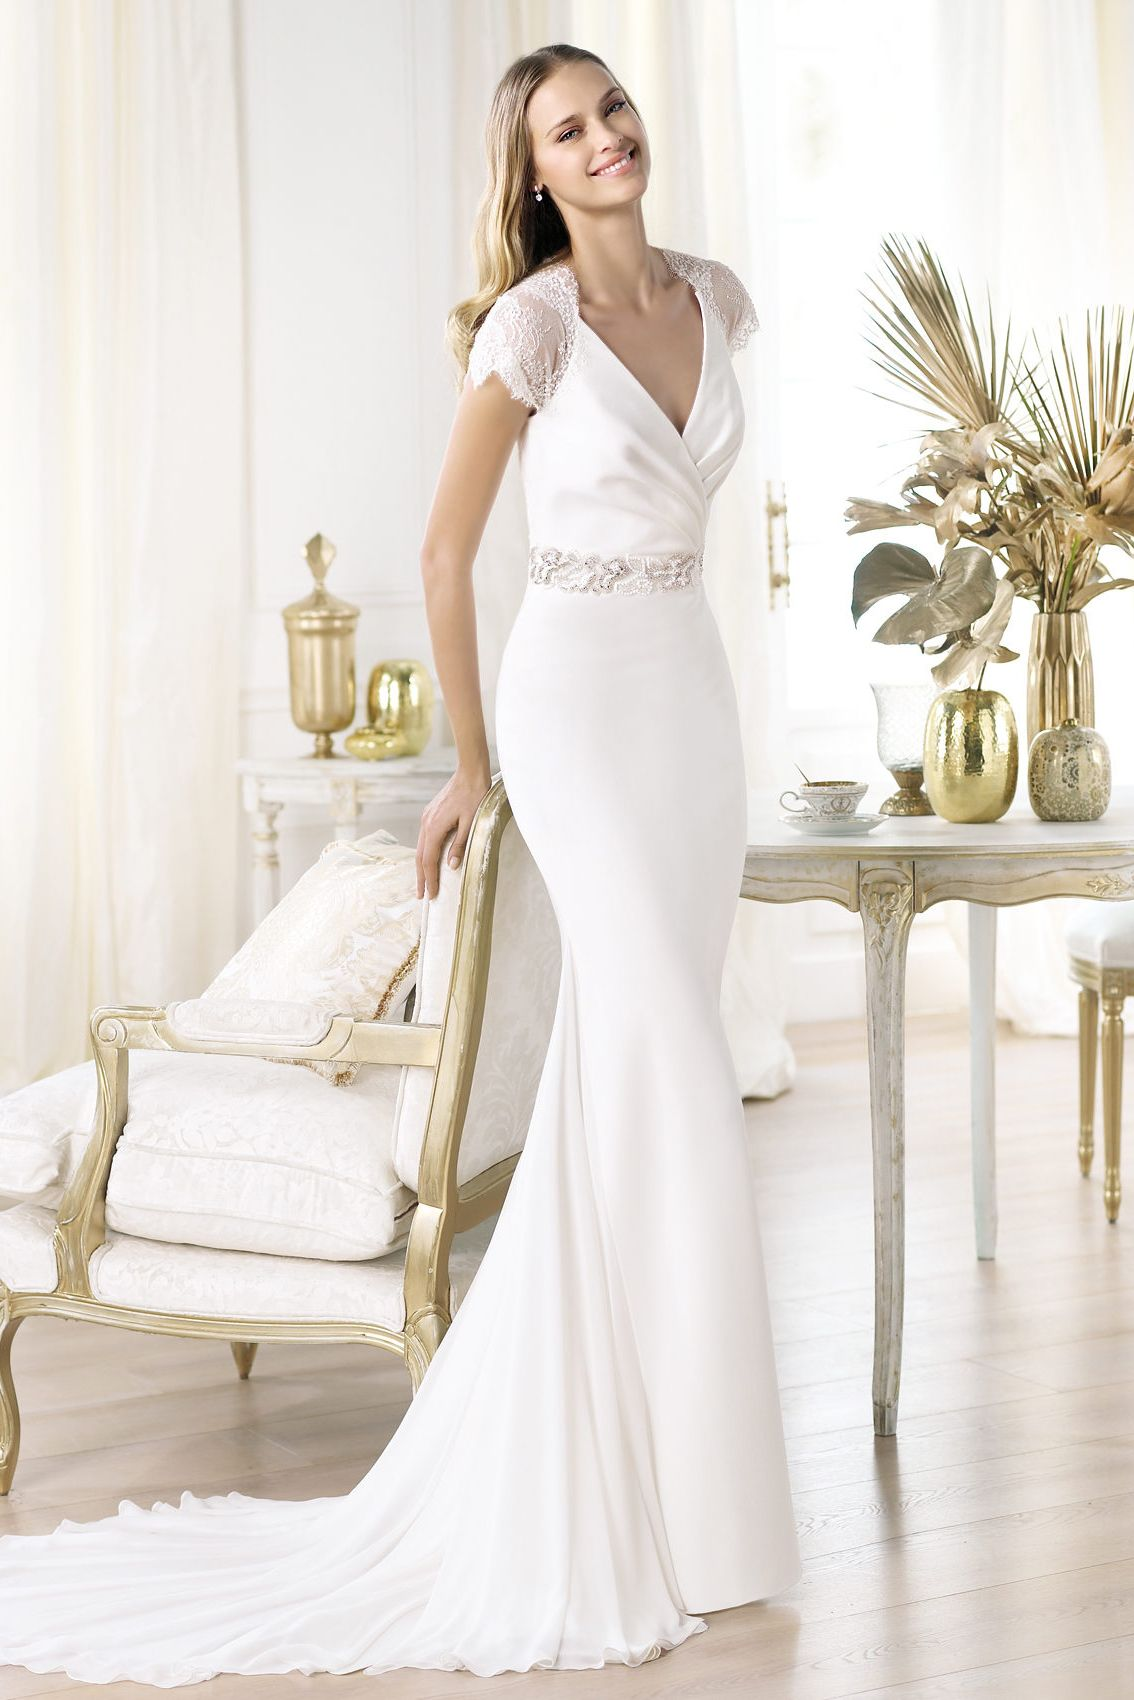 Buy Cheap Zoot Suit Wedding Dresses 75% Off - StylishPromDress ...